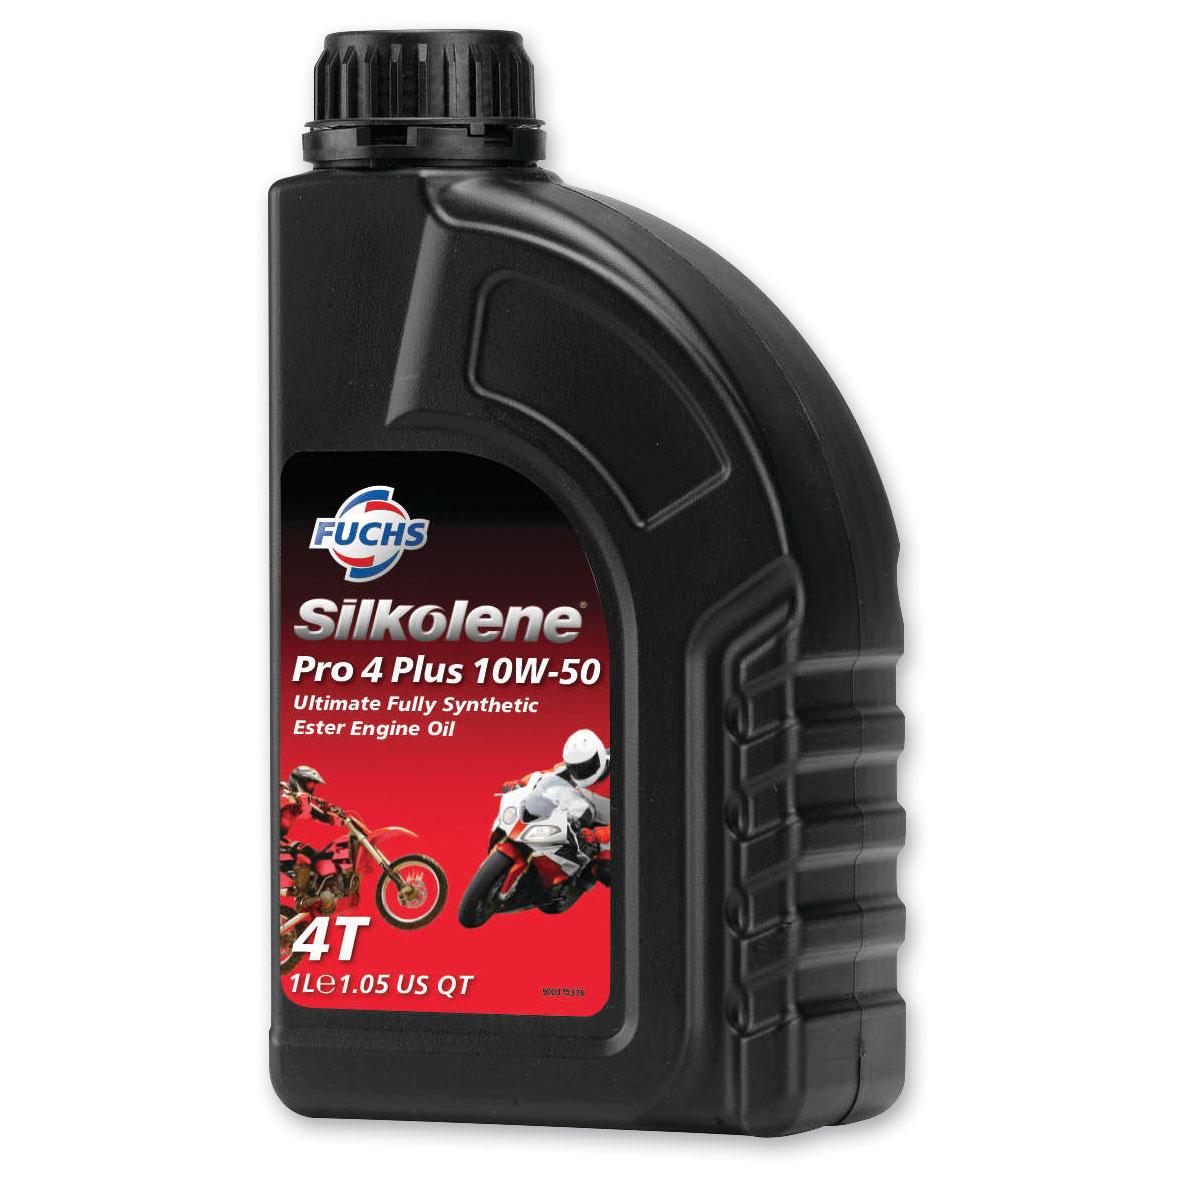 Silkolene Pro 4 Plus 10W50 Engine Oil Liter